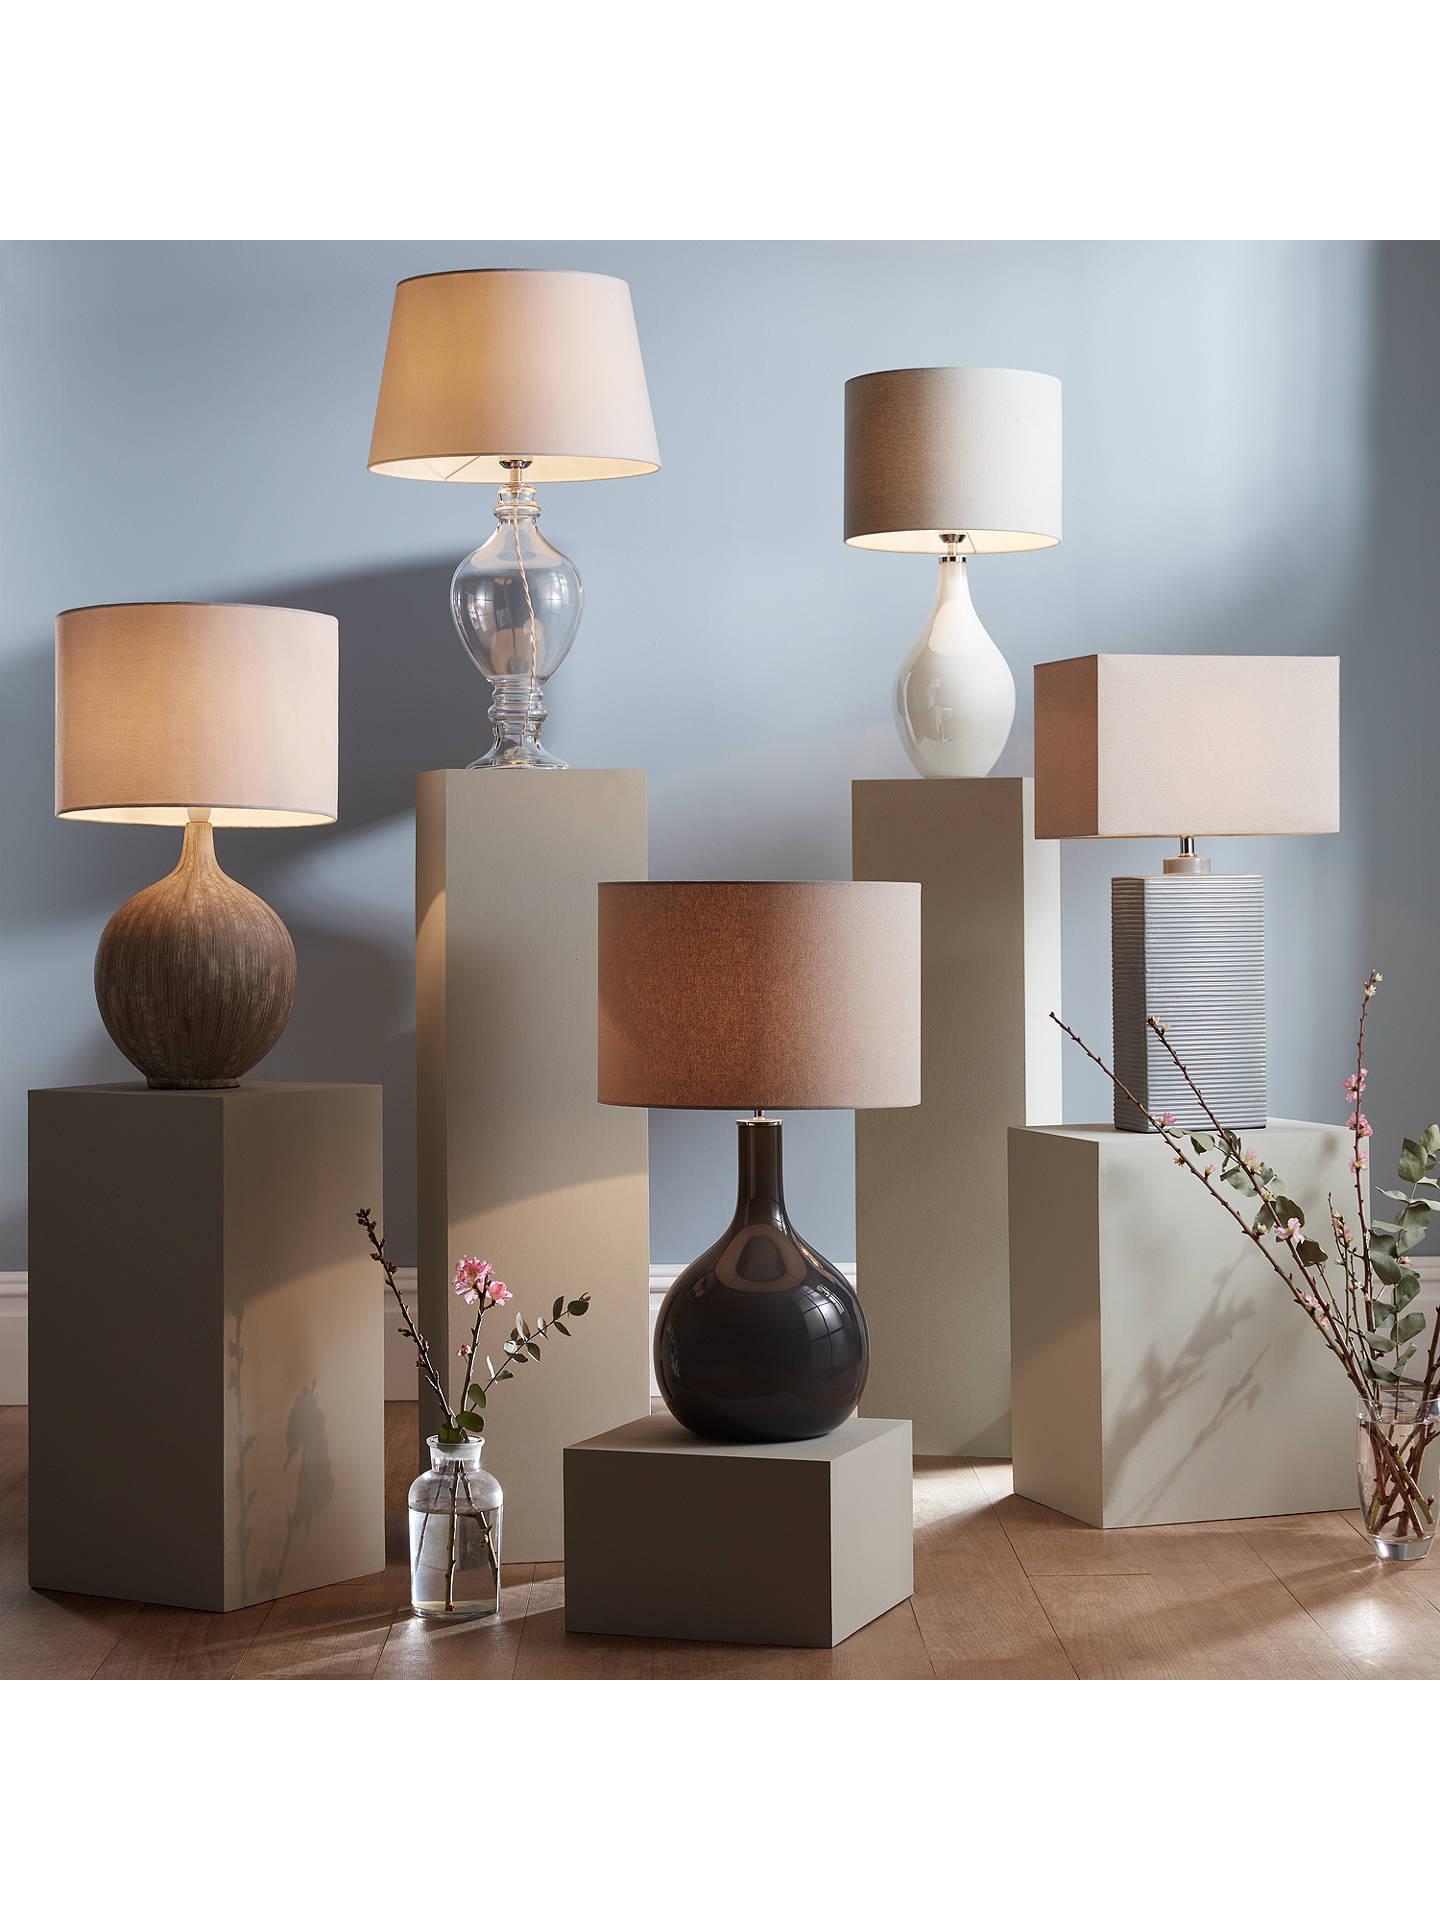 John Lewis & Partners Ebony Table Lamp Large At John Lewis & Partners